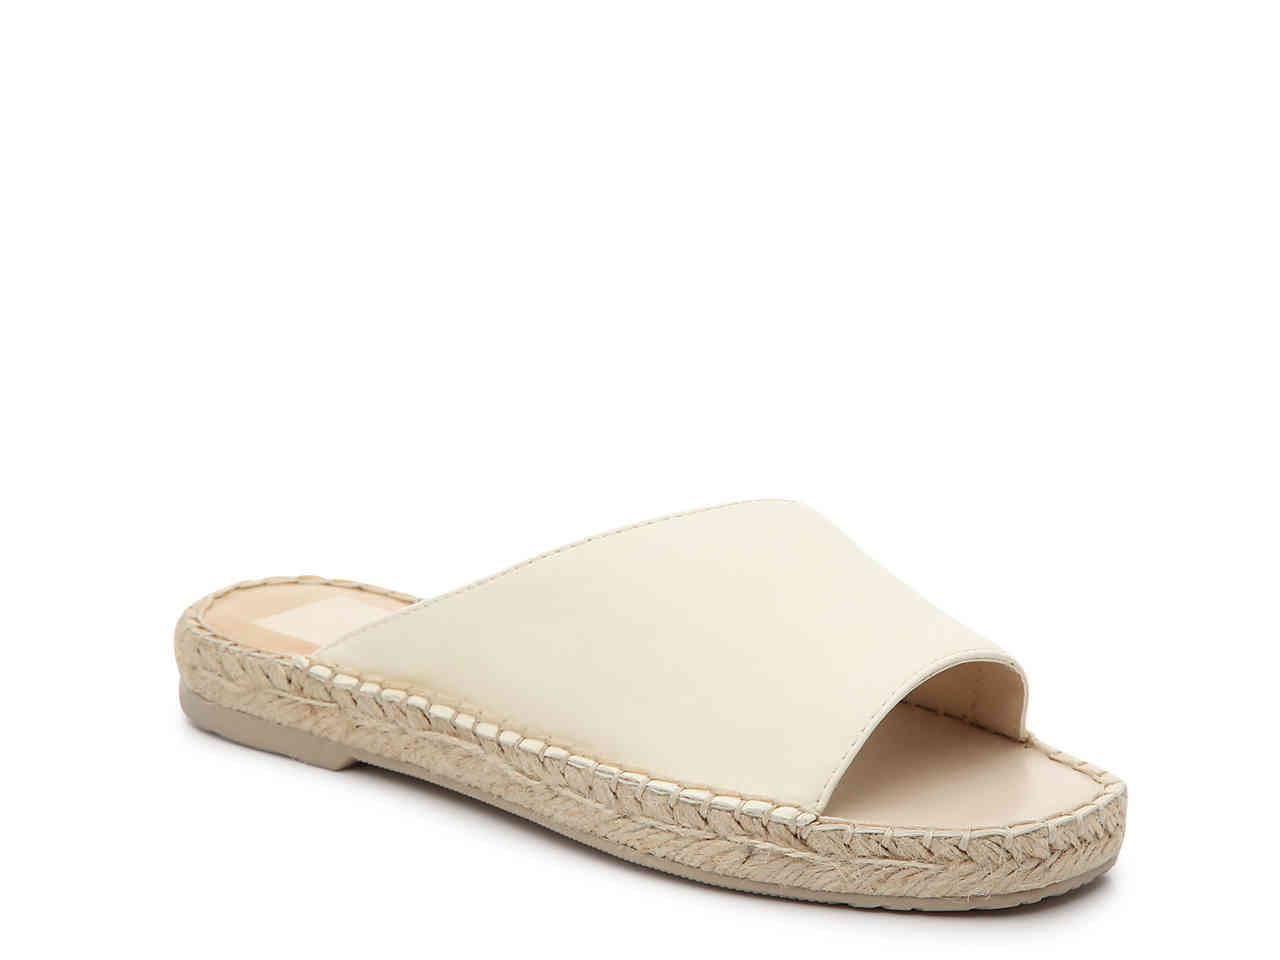 Nude Espadrille Sandals.jpg